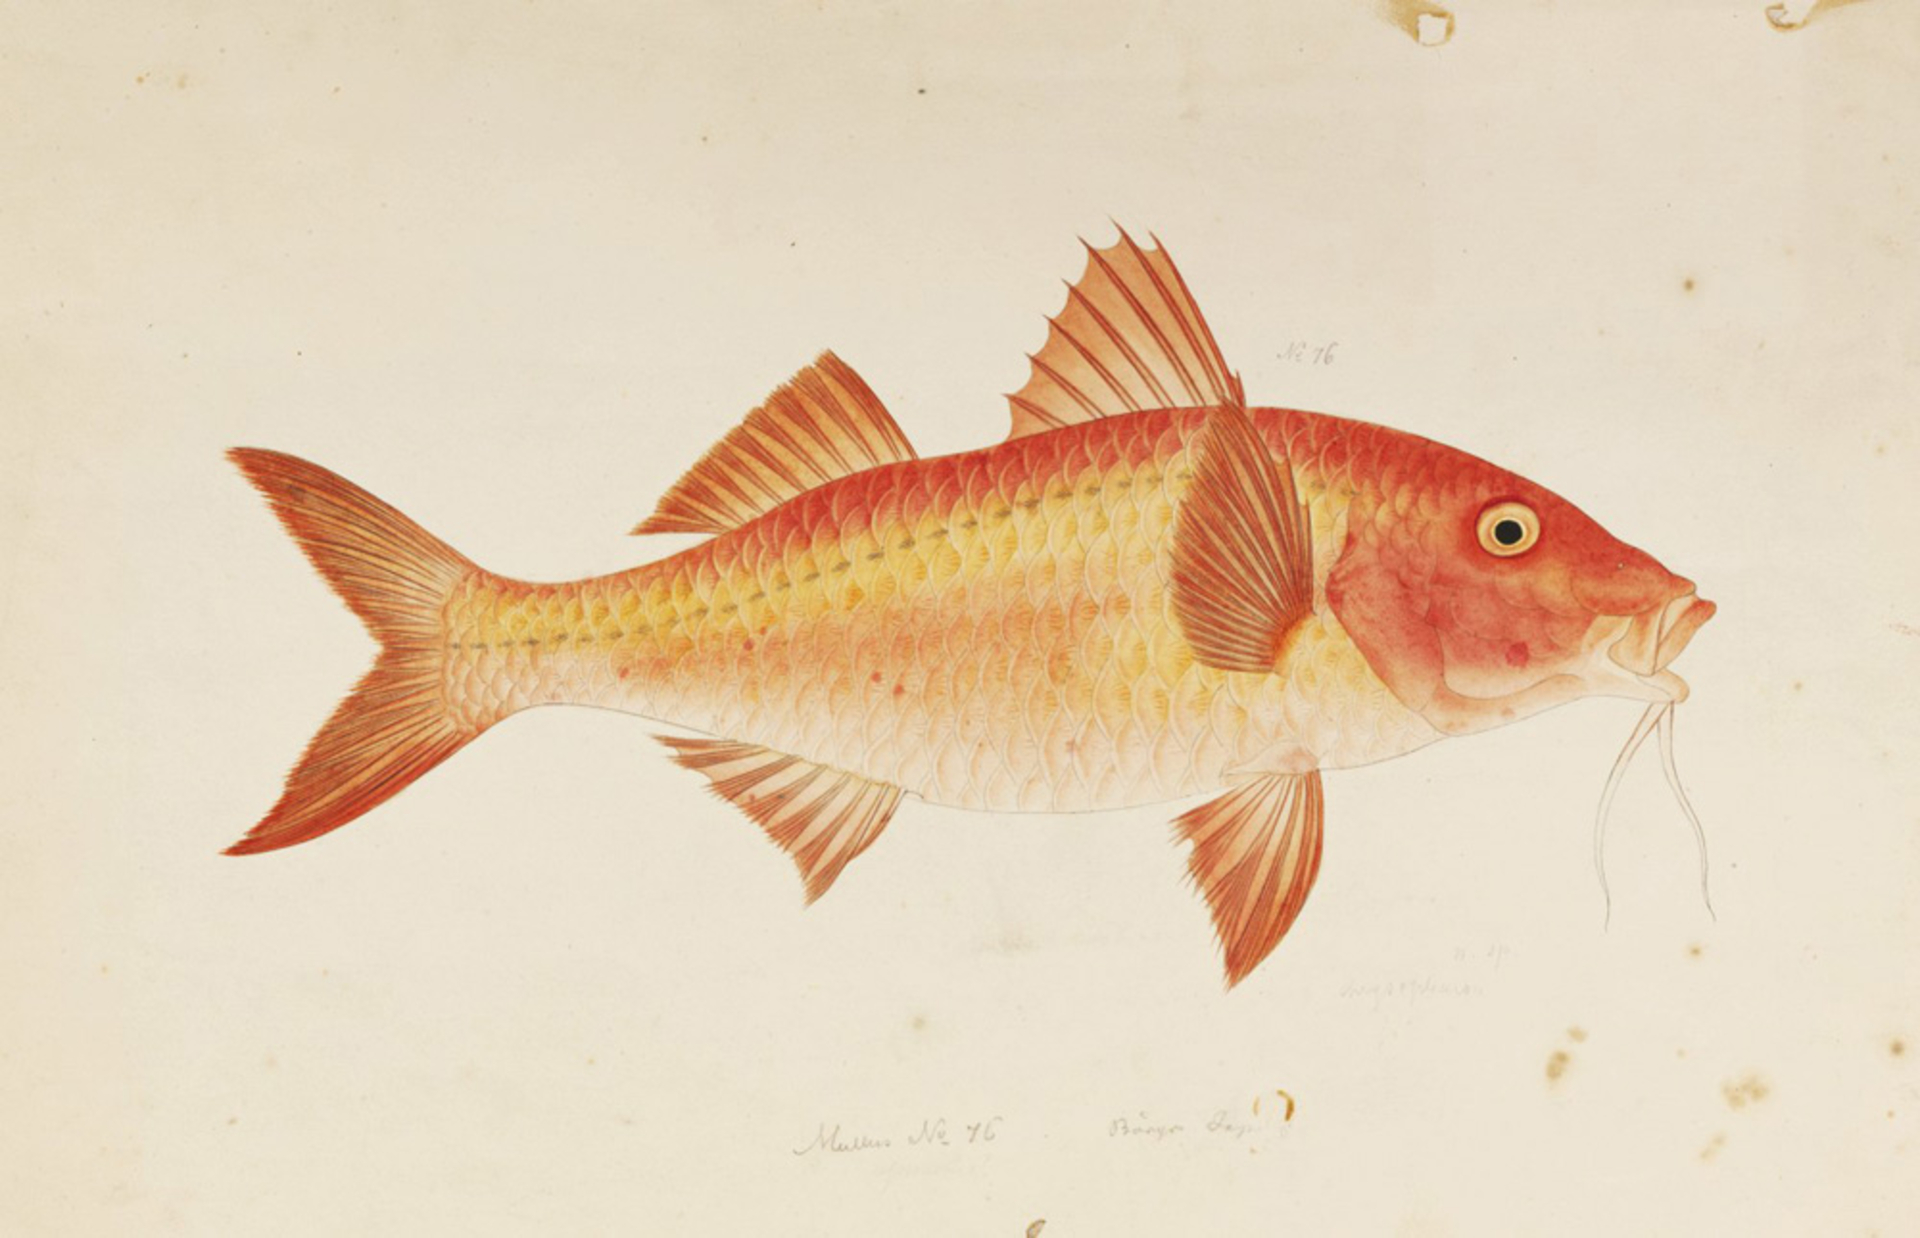 RMNH.ART.173 | Parupeneus chrysopleuron